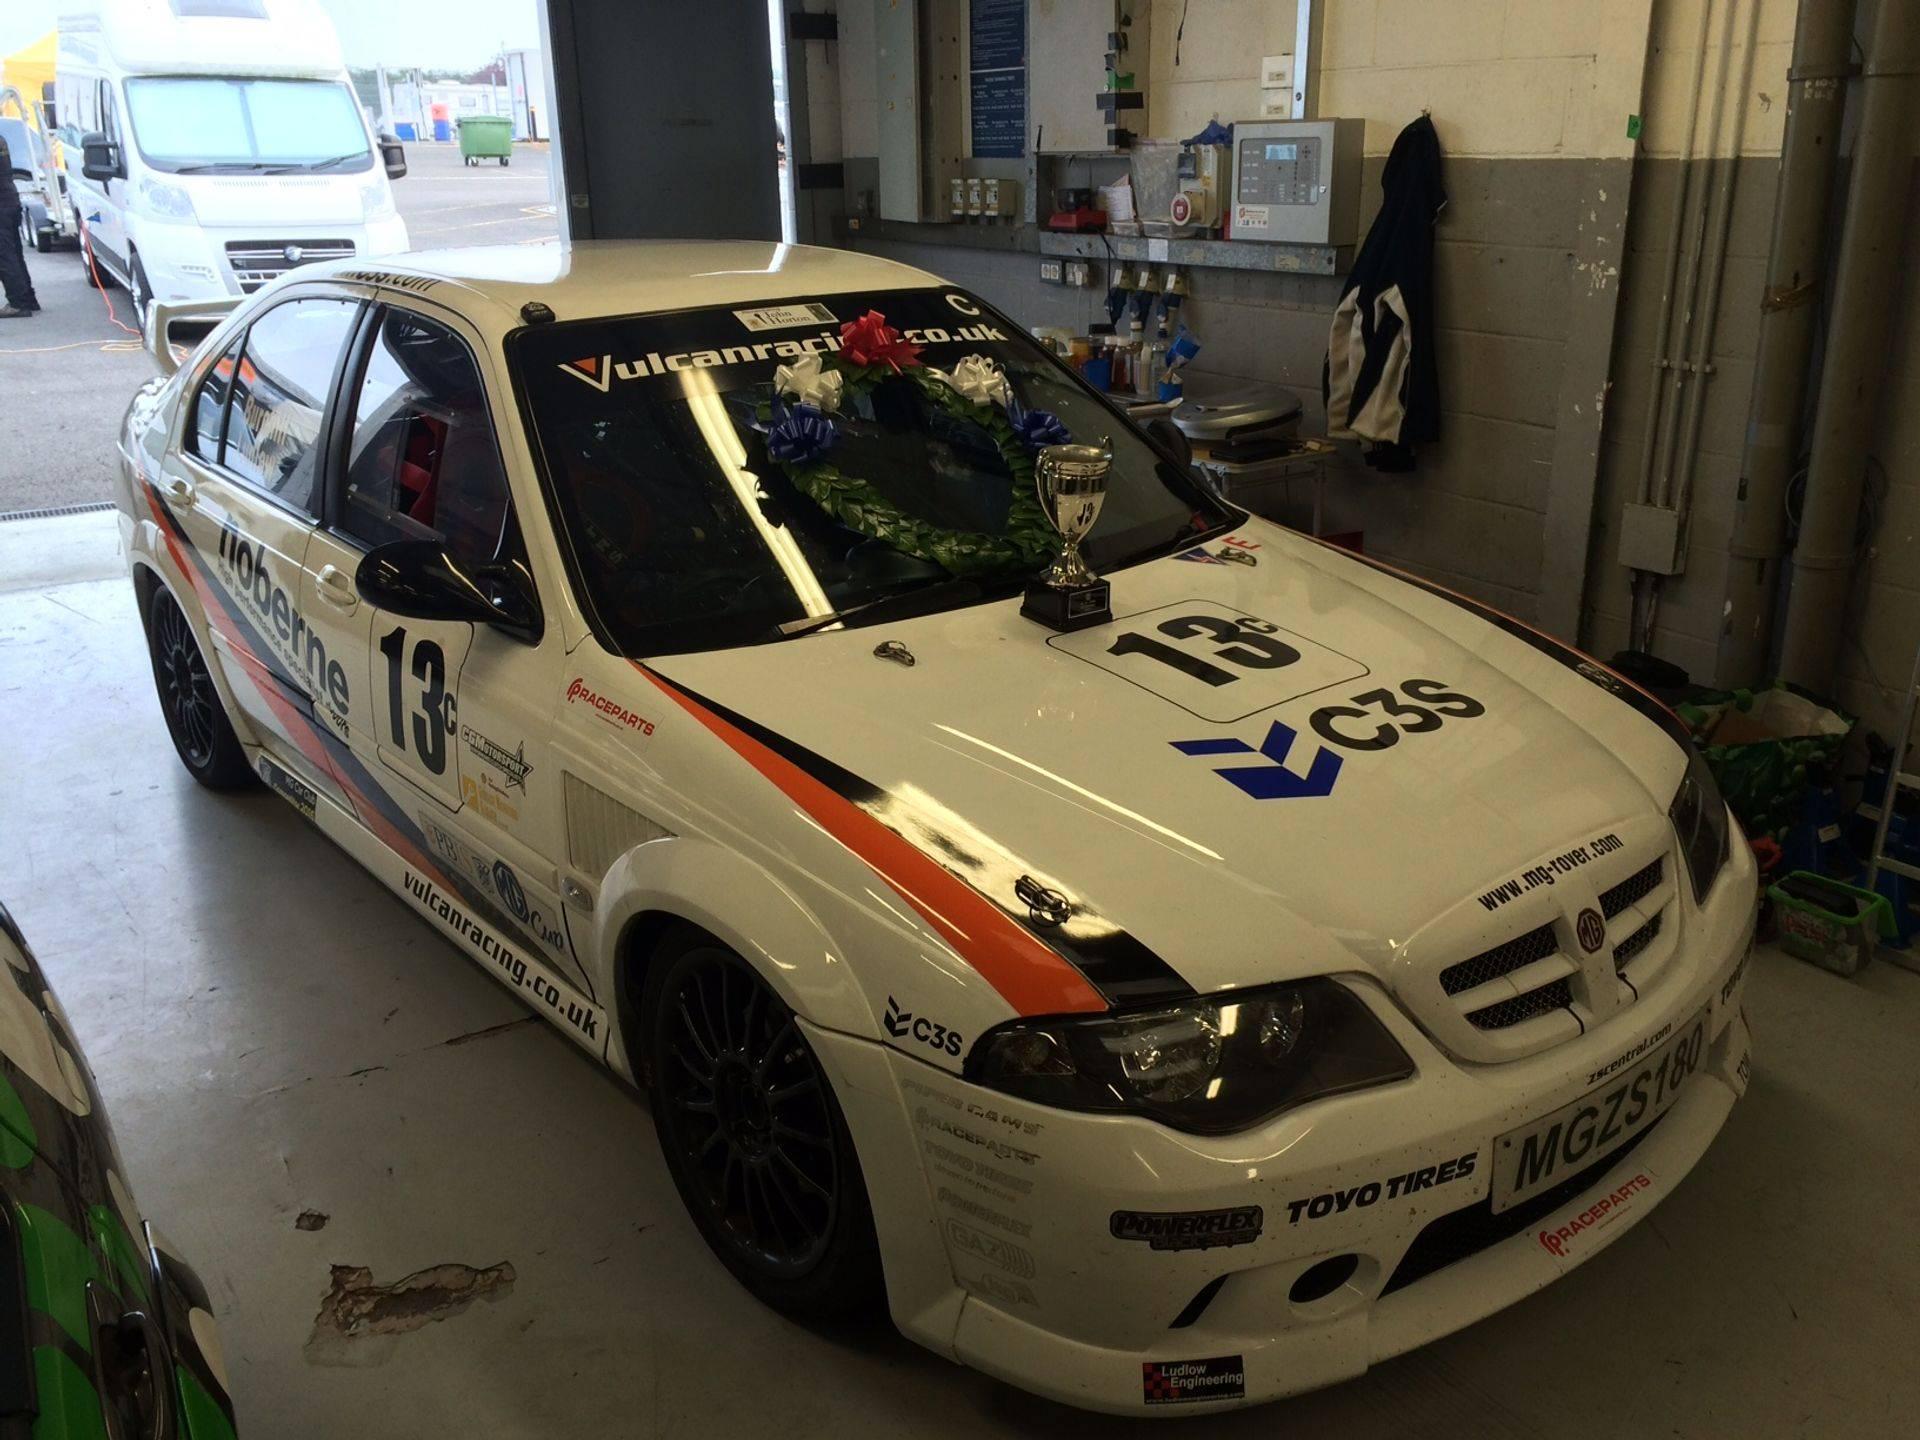 MGZS V6 180 Race Car Vulcan Racing Silverstone MG Live Peter Best Insurance Winner Dan Ludlow